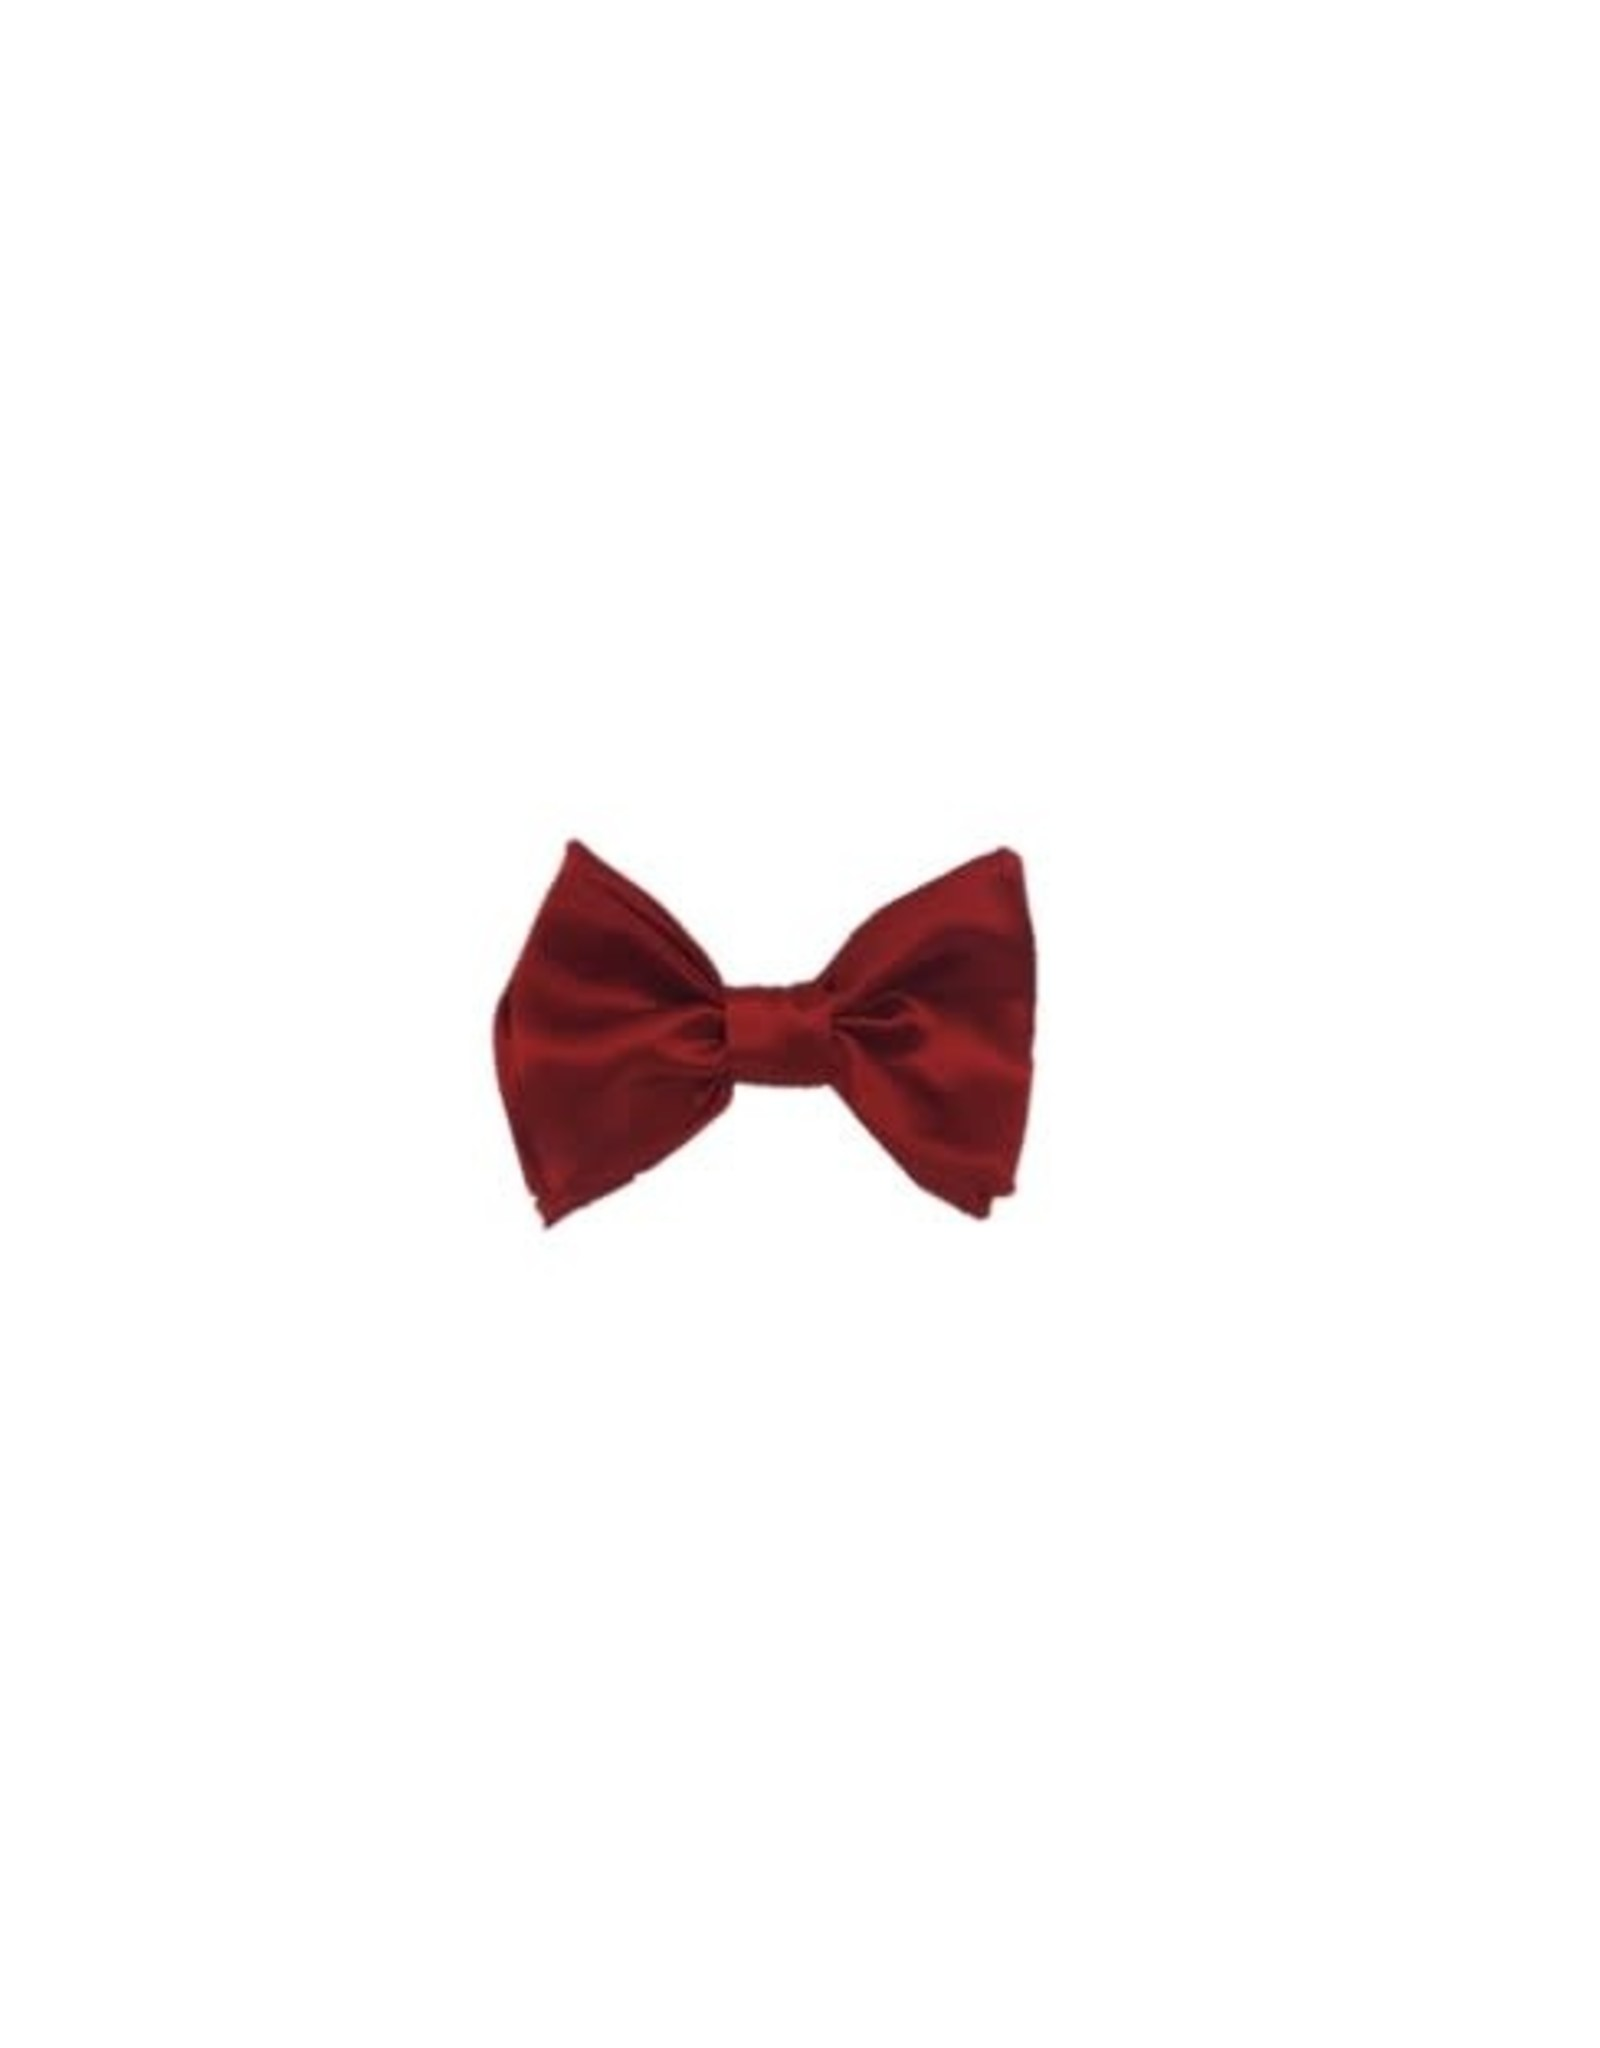 Karries Kostumes Handmade Double Layer Bow Tie